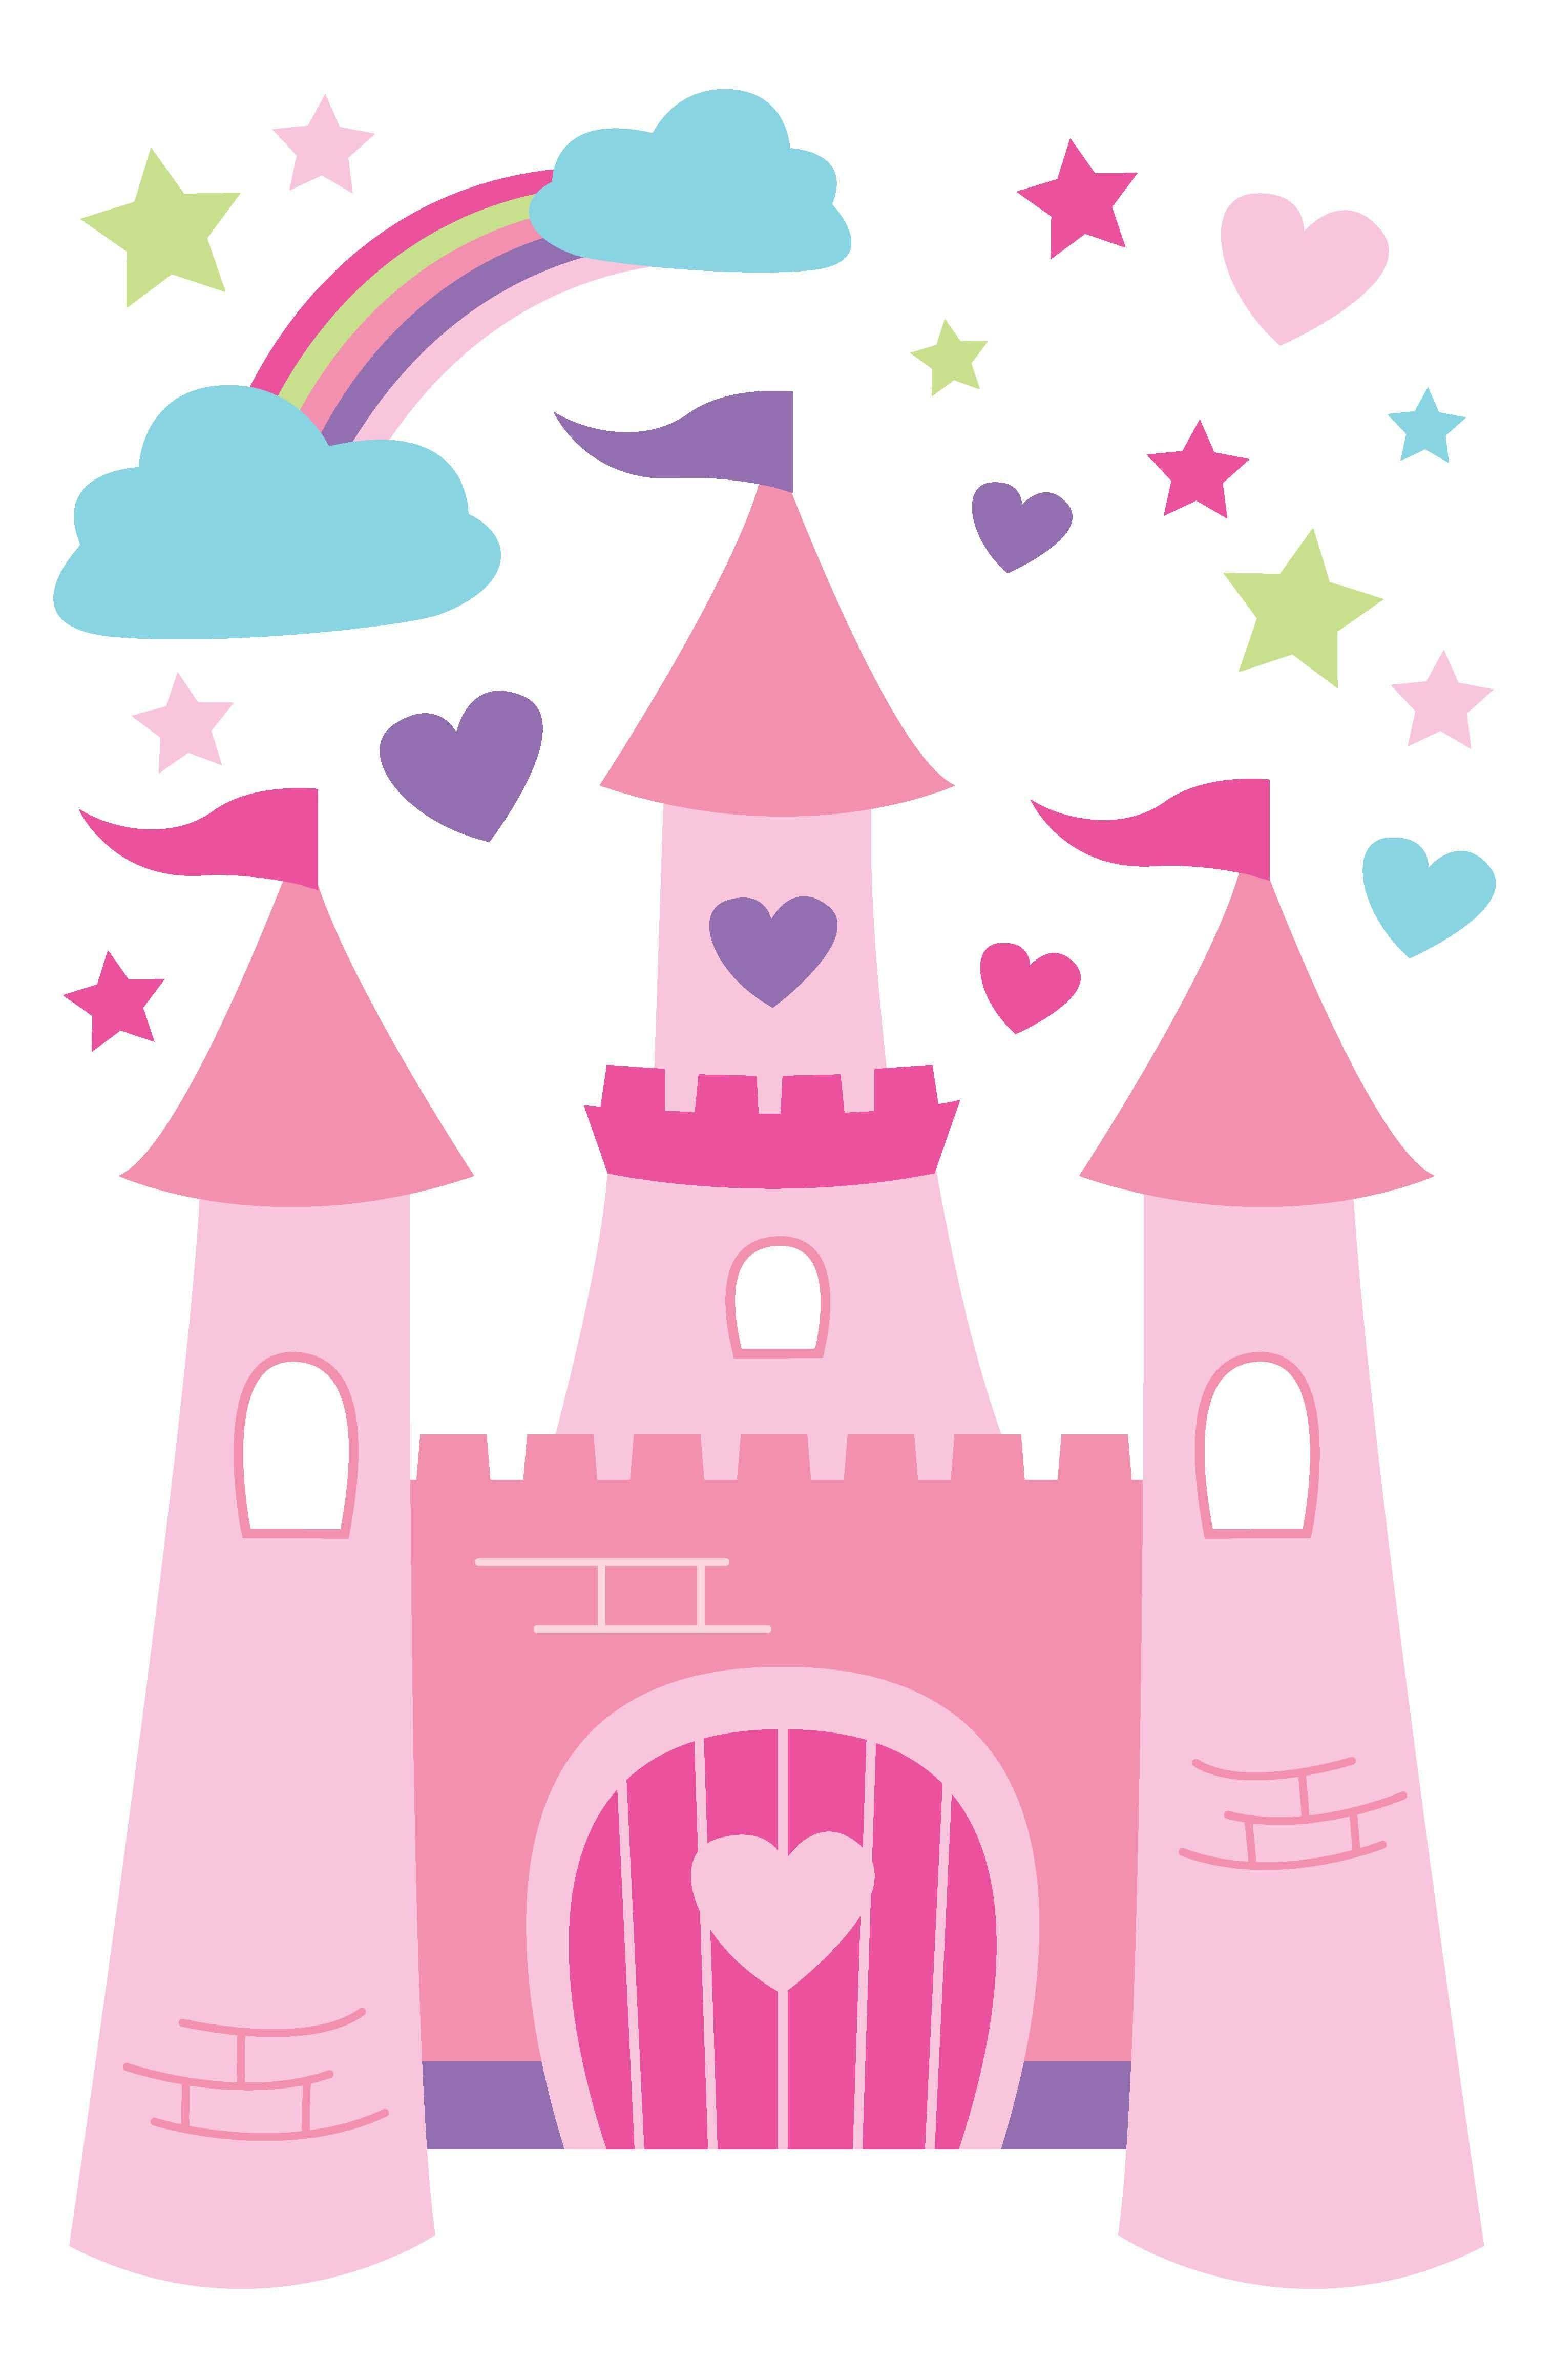 Castle Castelo Princesas Disney Ilustracao De Castelo Adesivos De Parede